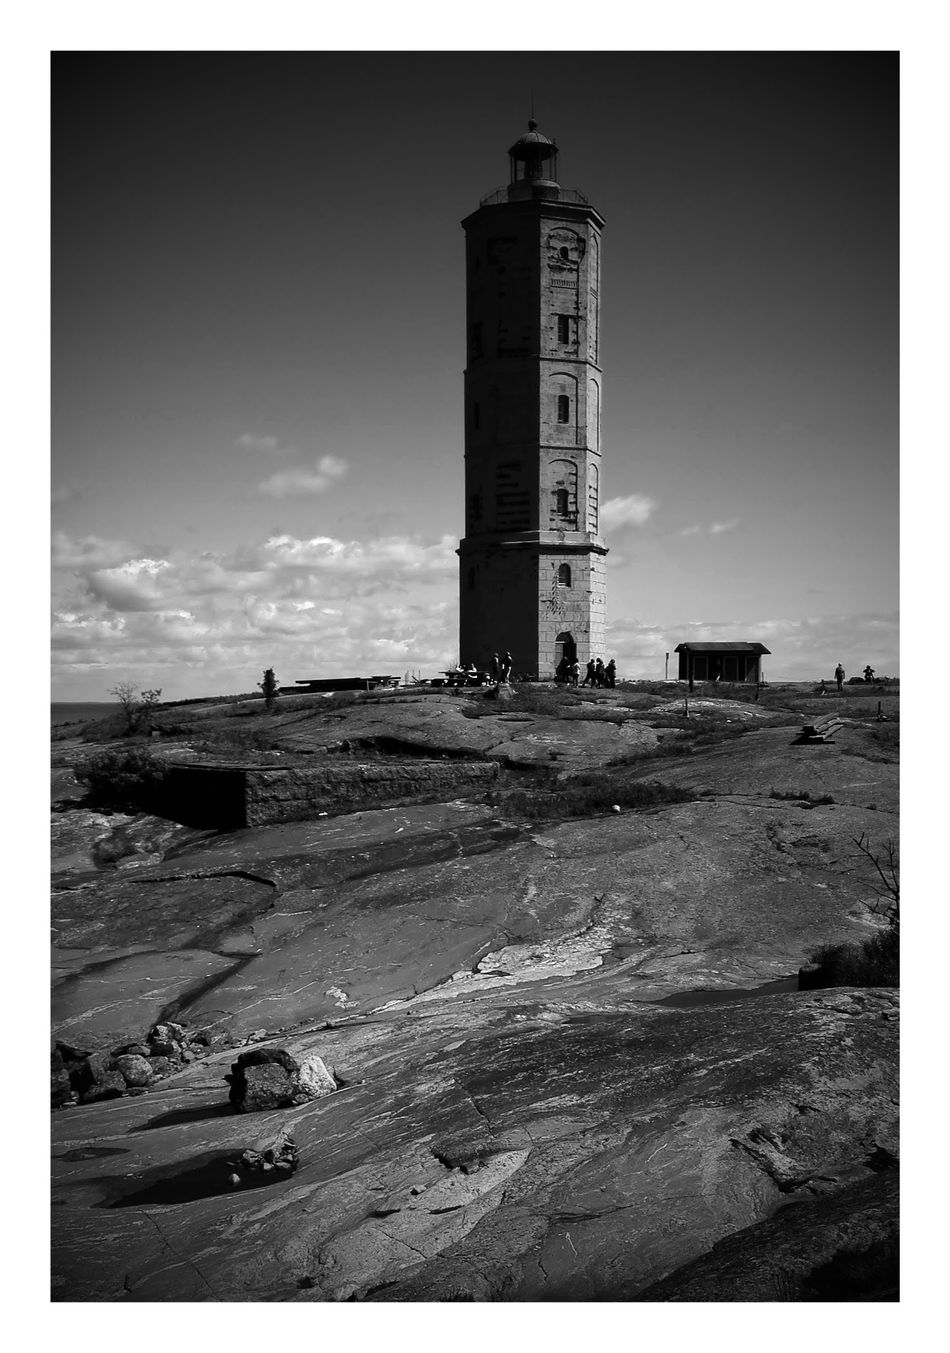 Söderskär Lighthouse Island Rock Archipelago Blackandwhite